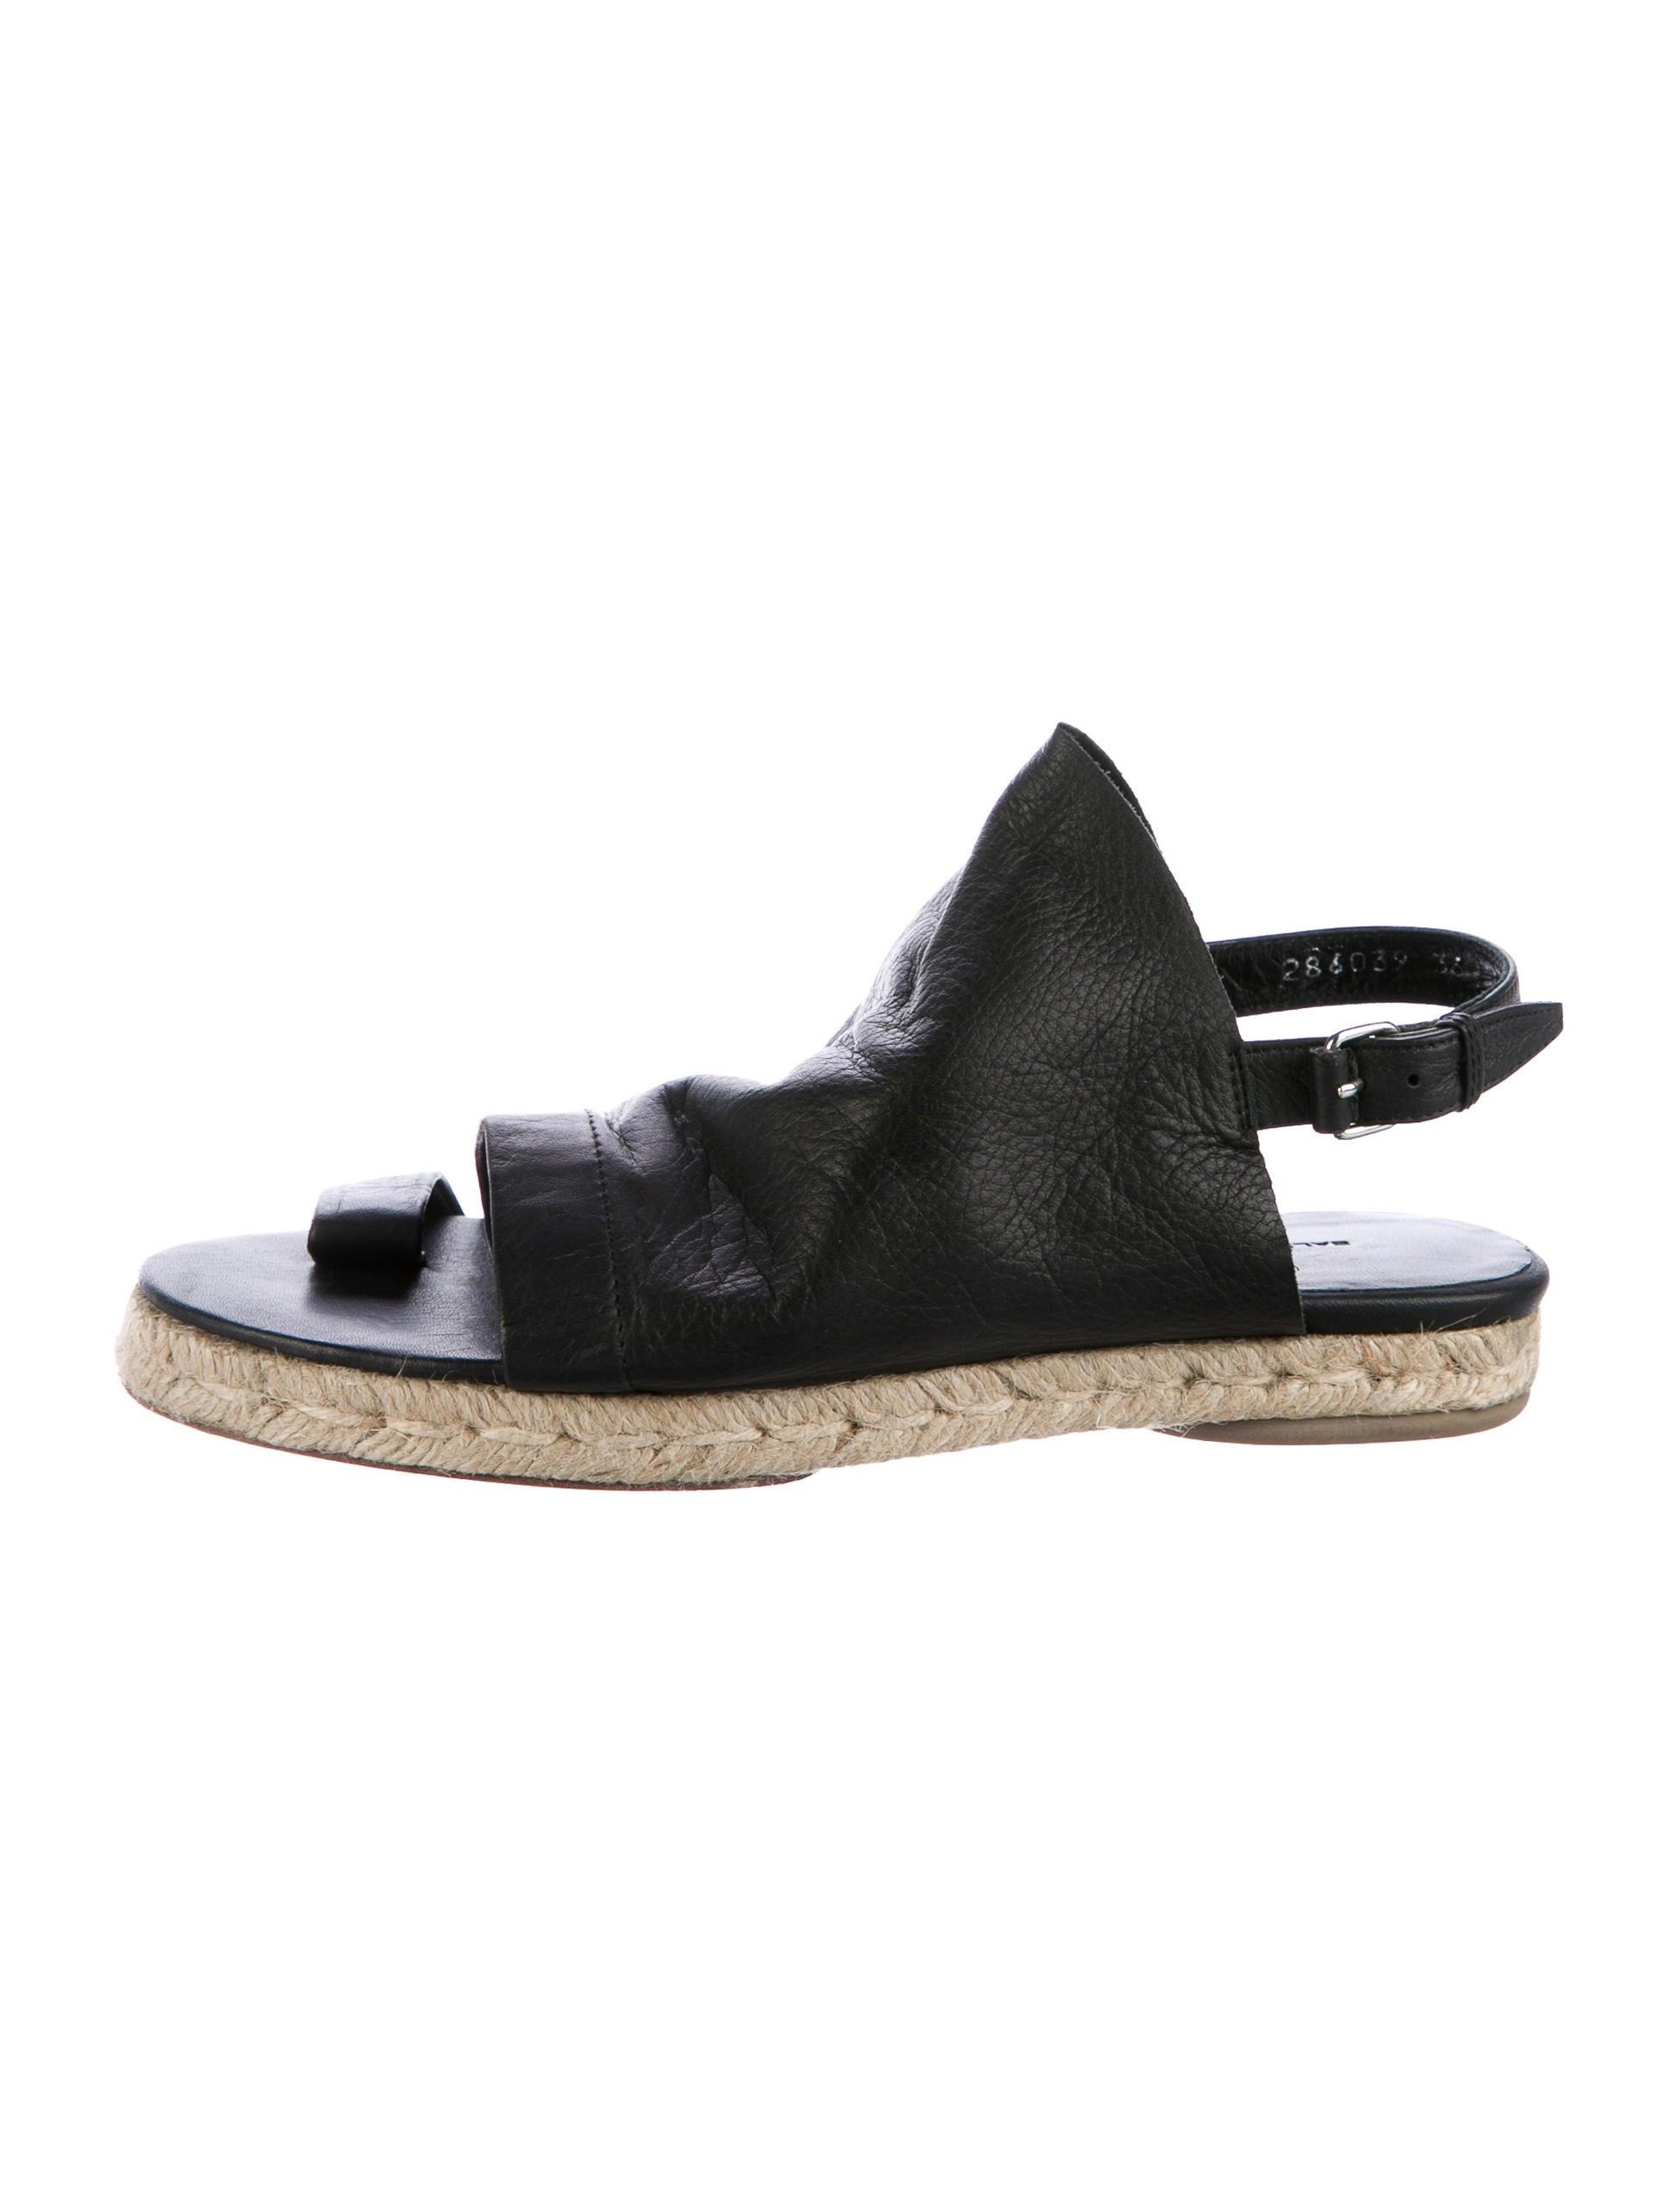 best sale cheap price best sale sale online Balenciaga Jute-Accented Suede Wedge Sandals bFMnbSaN